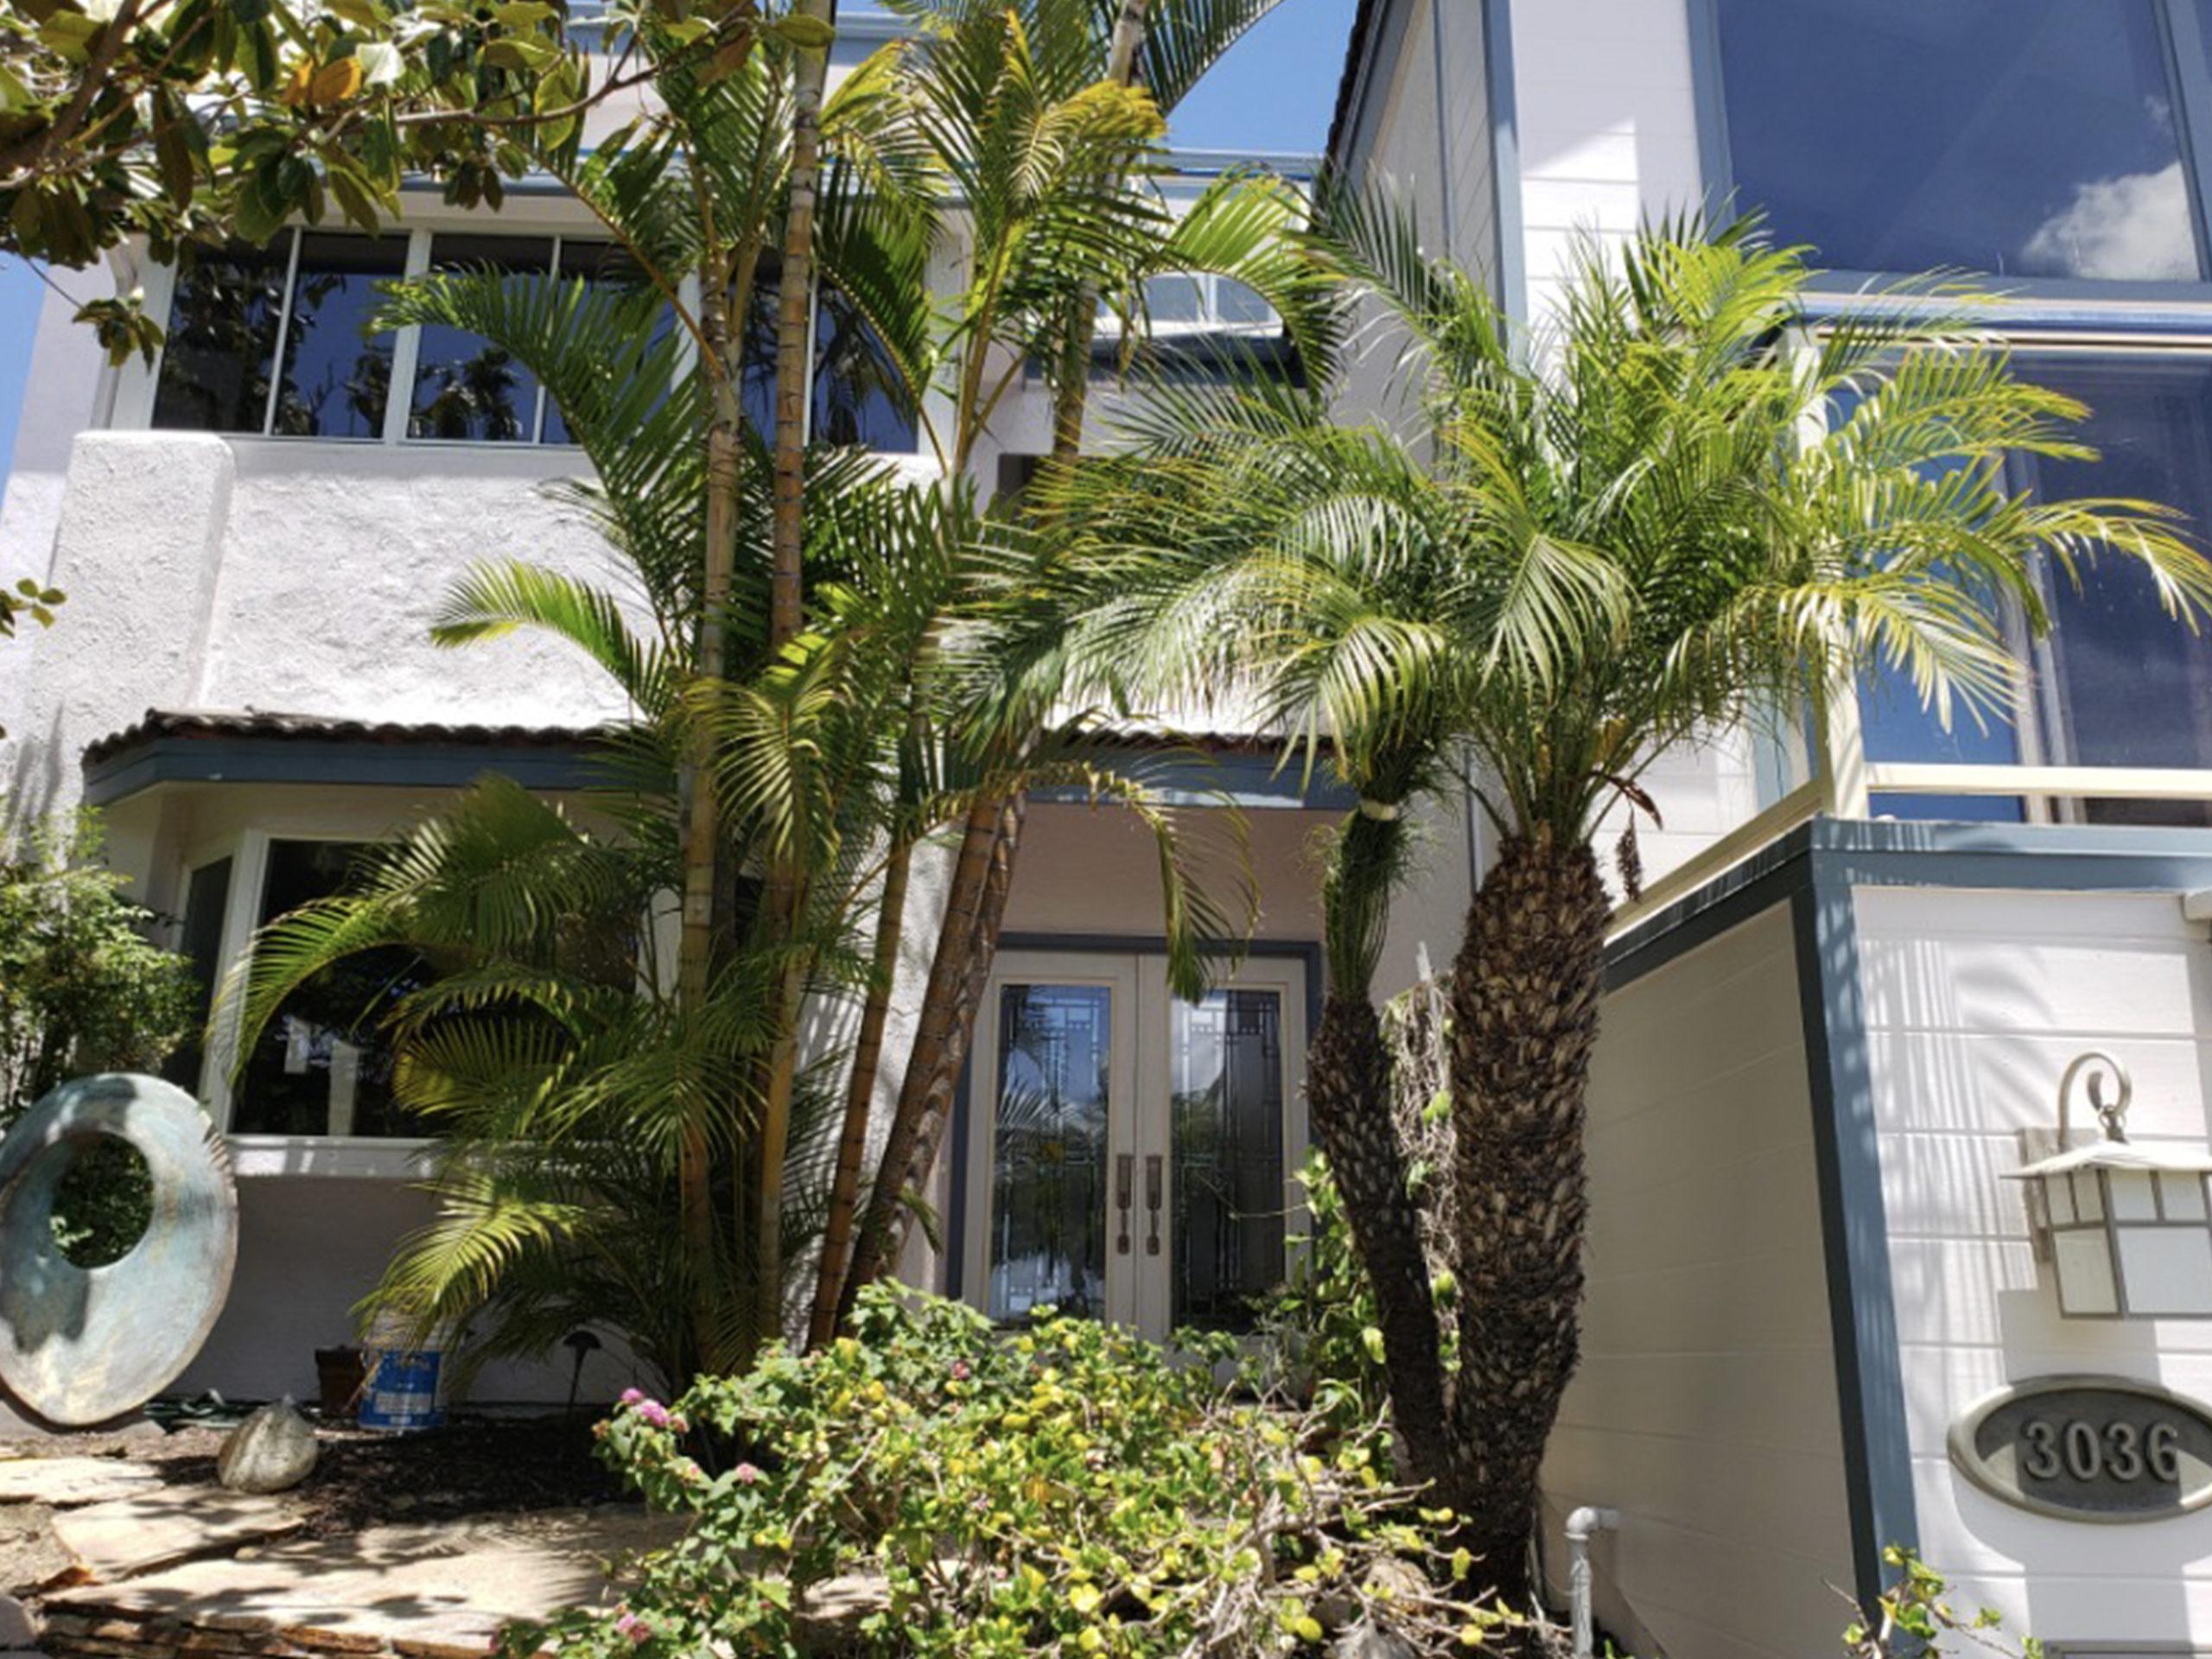 Exterior + Coating + San Diego